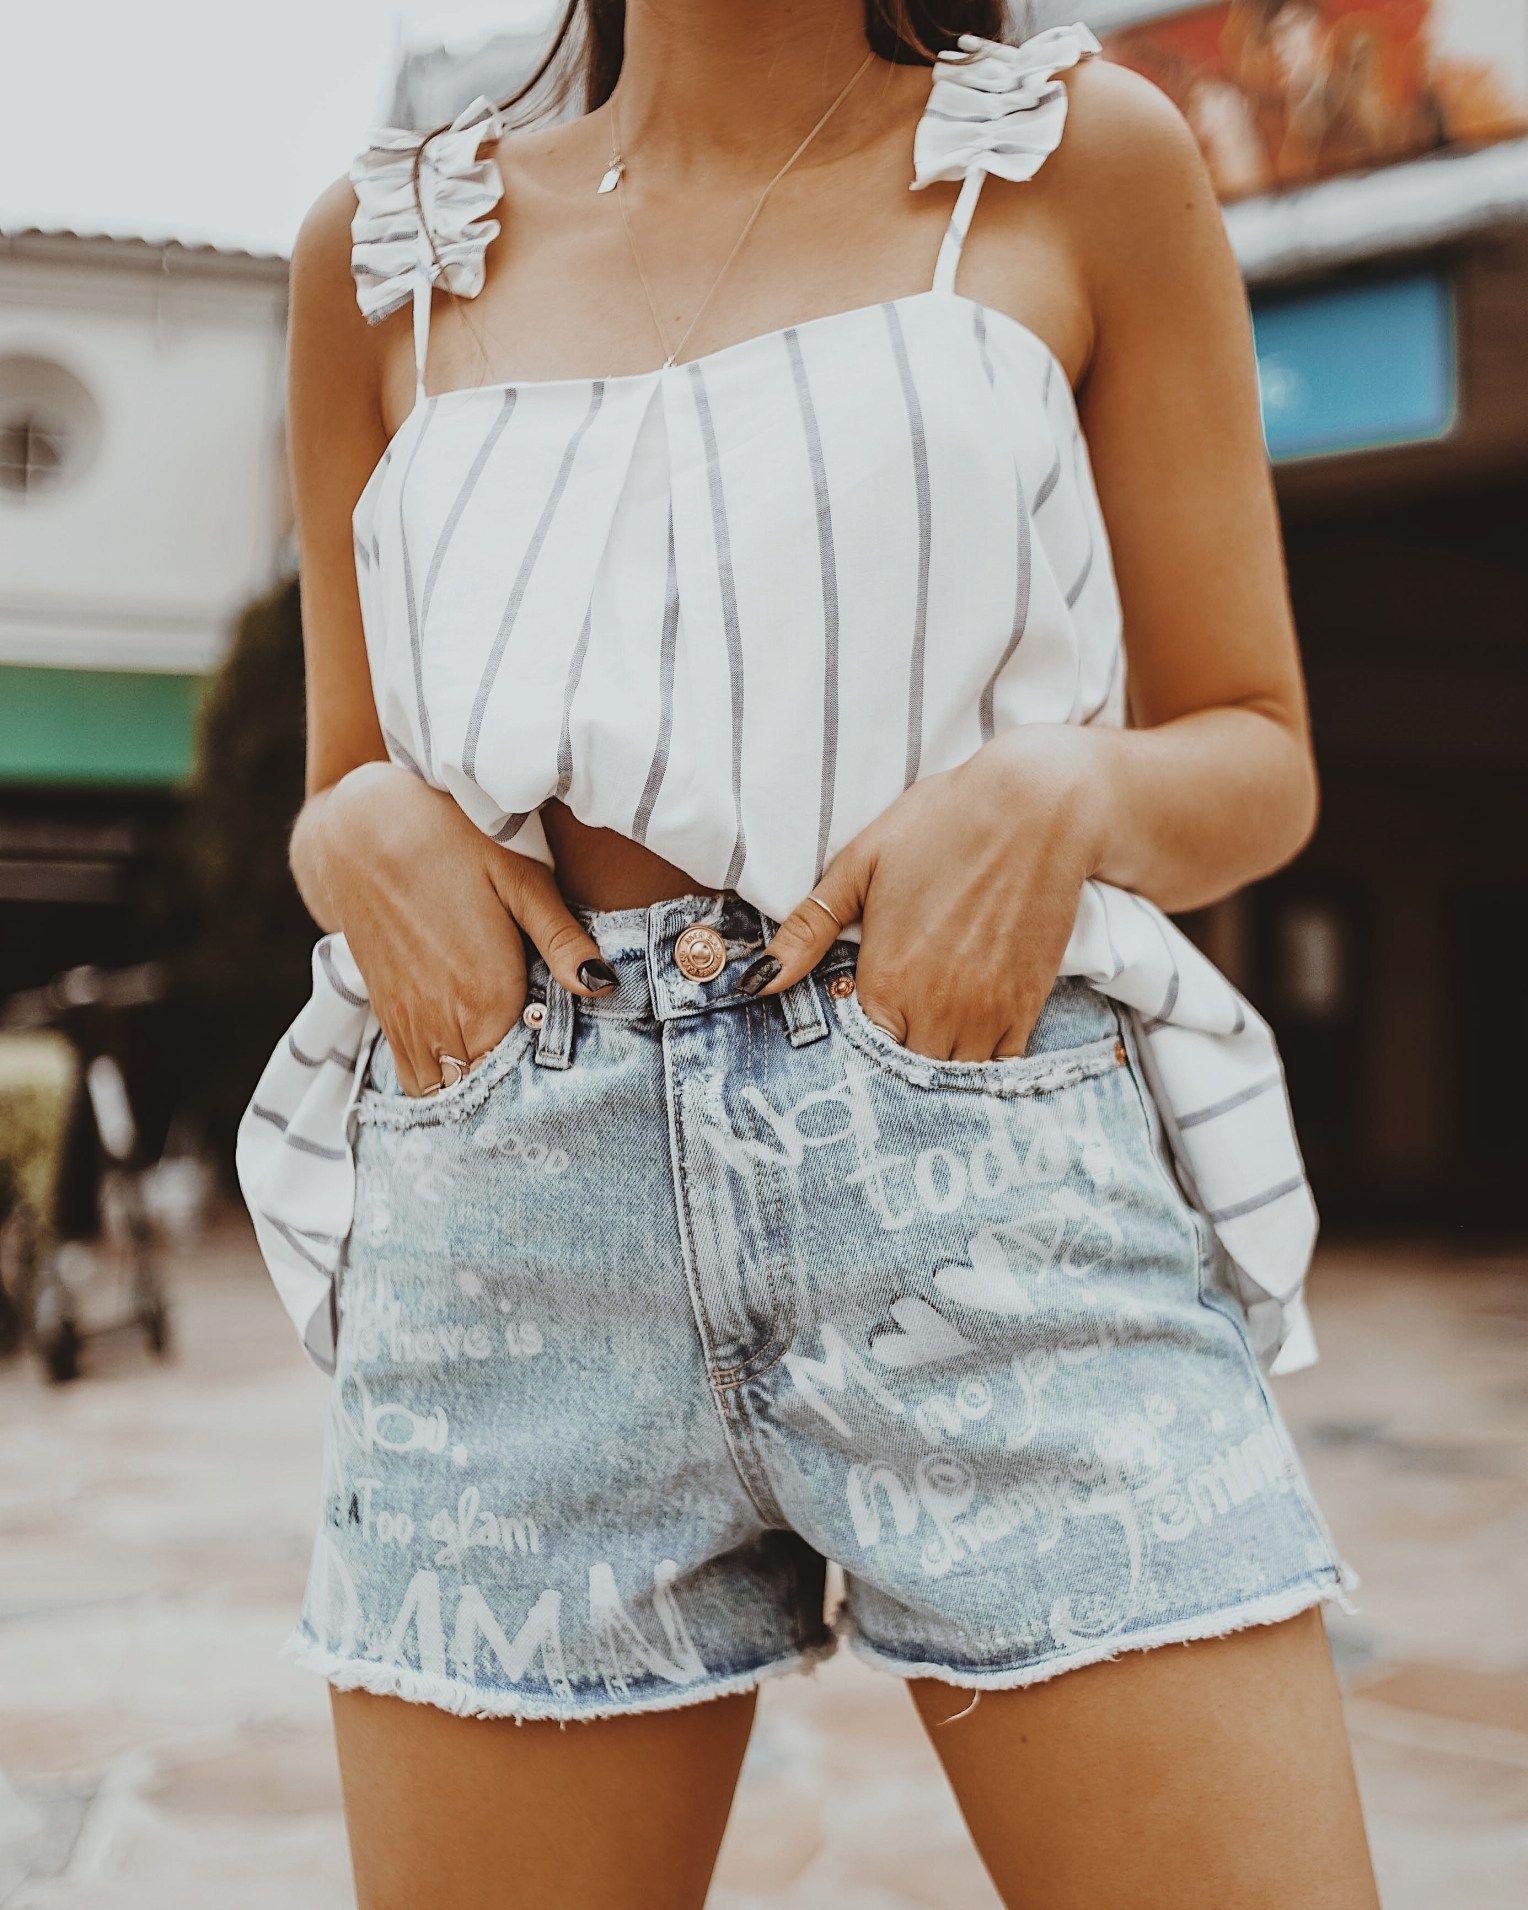 1f3e5e8999 ... insta style, brunette girls, fashion bloggers, california girls, cali  style, river island, funky denim, denim shorts for summer, trendy denim